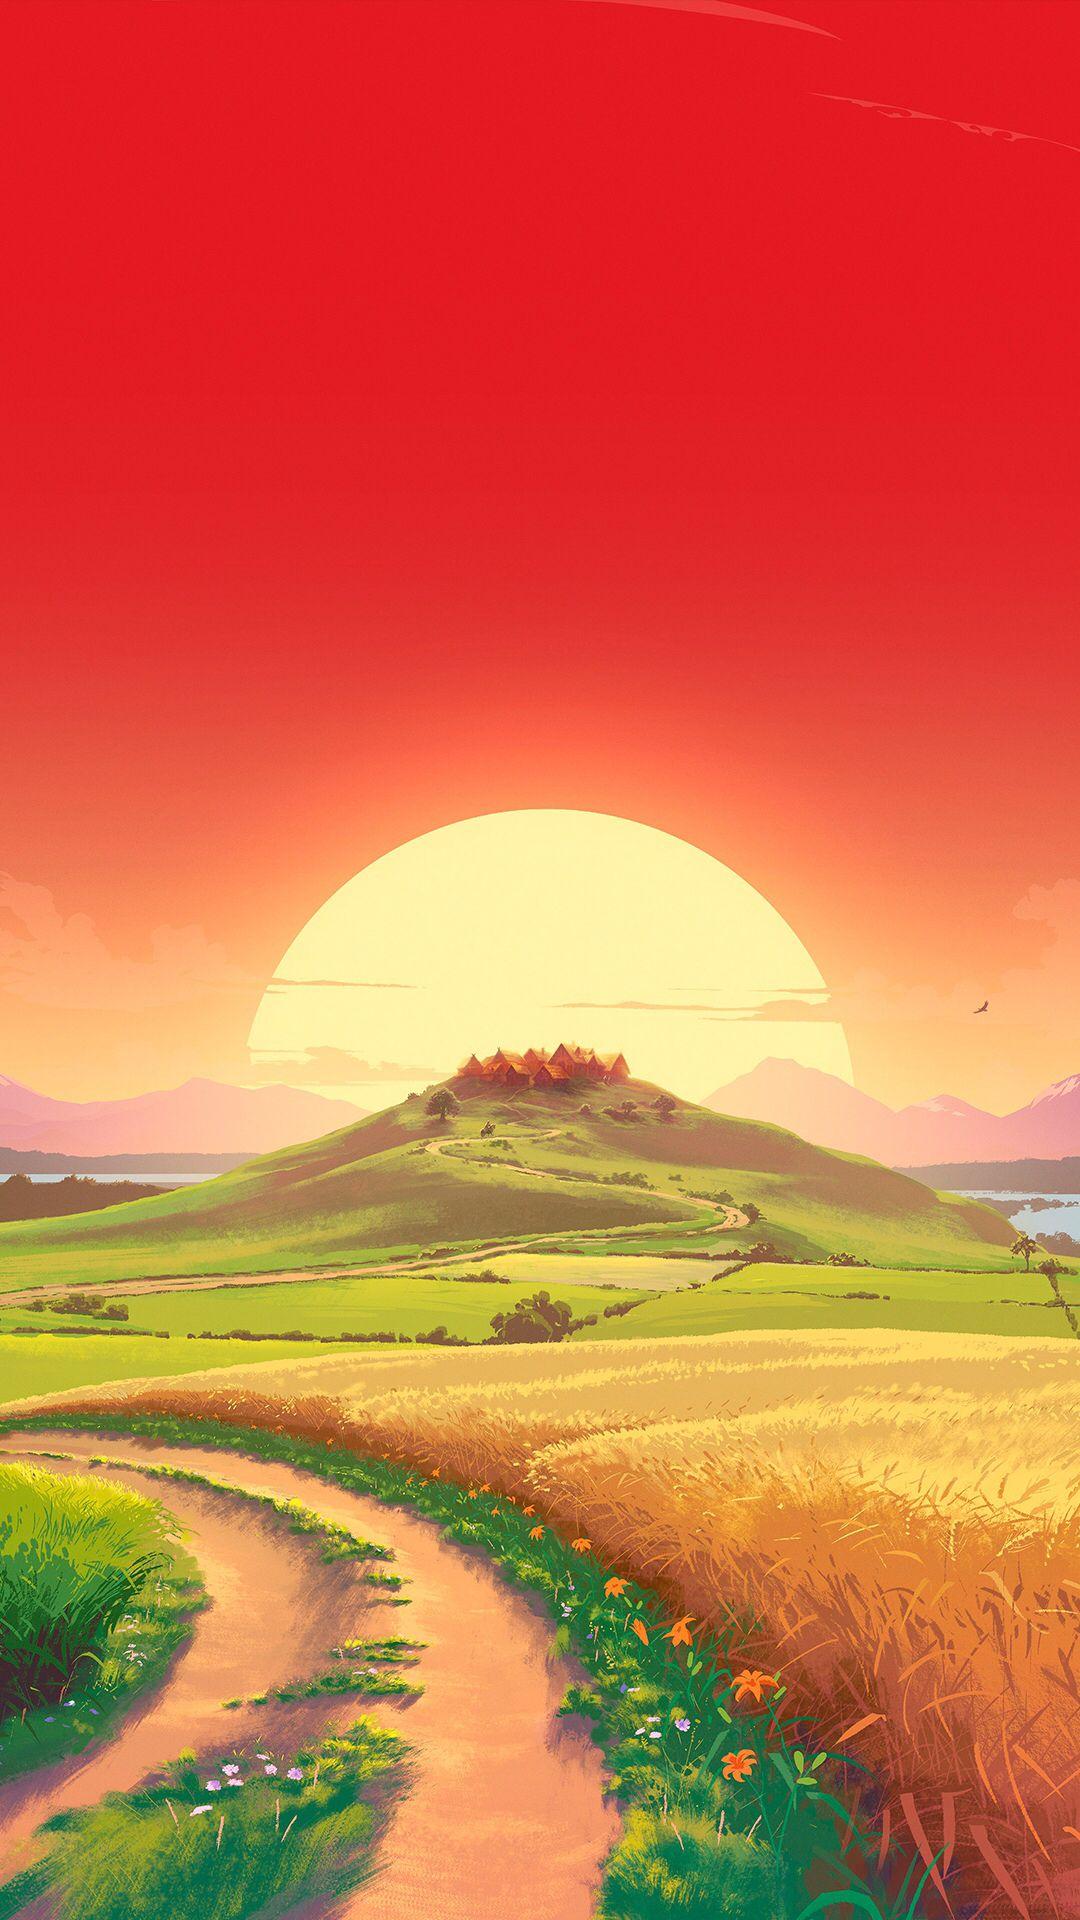 Pin By Yuu Chan On Fondos Para Iphone Landscape Wallpaper Scenery Wallpaper Hd Nature Wallpapers